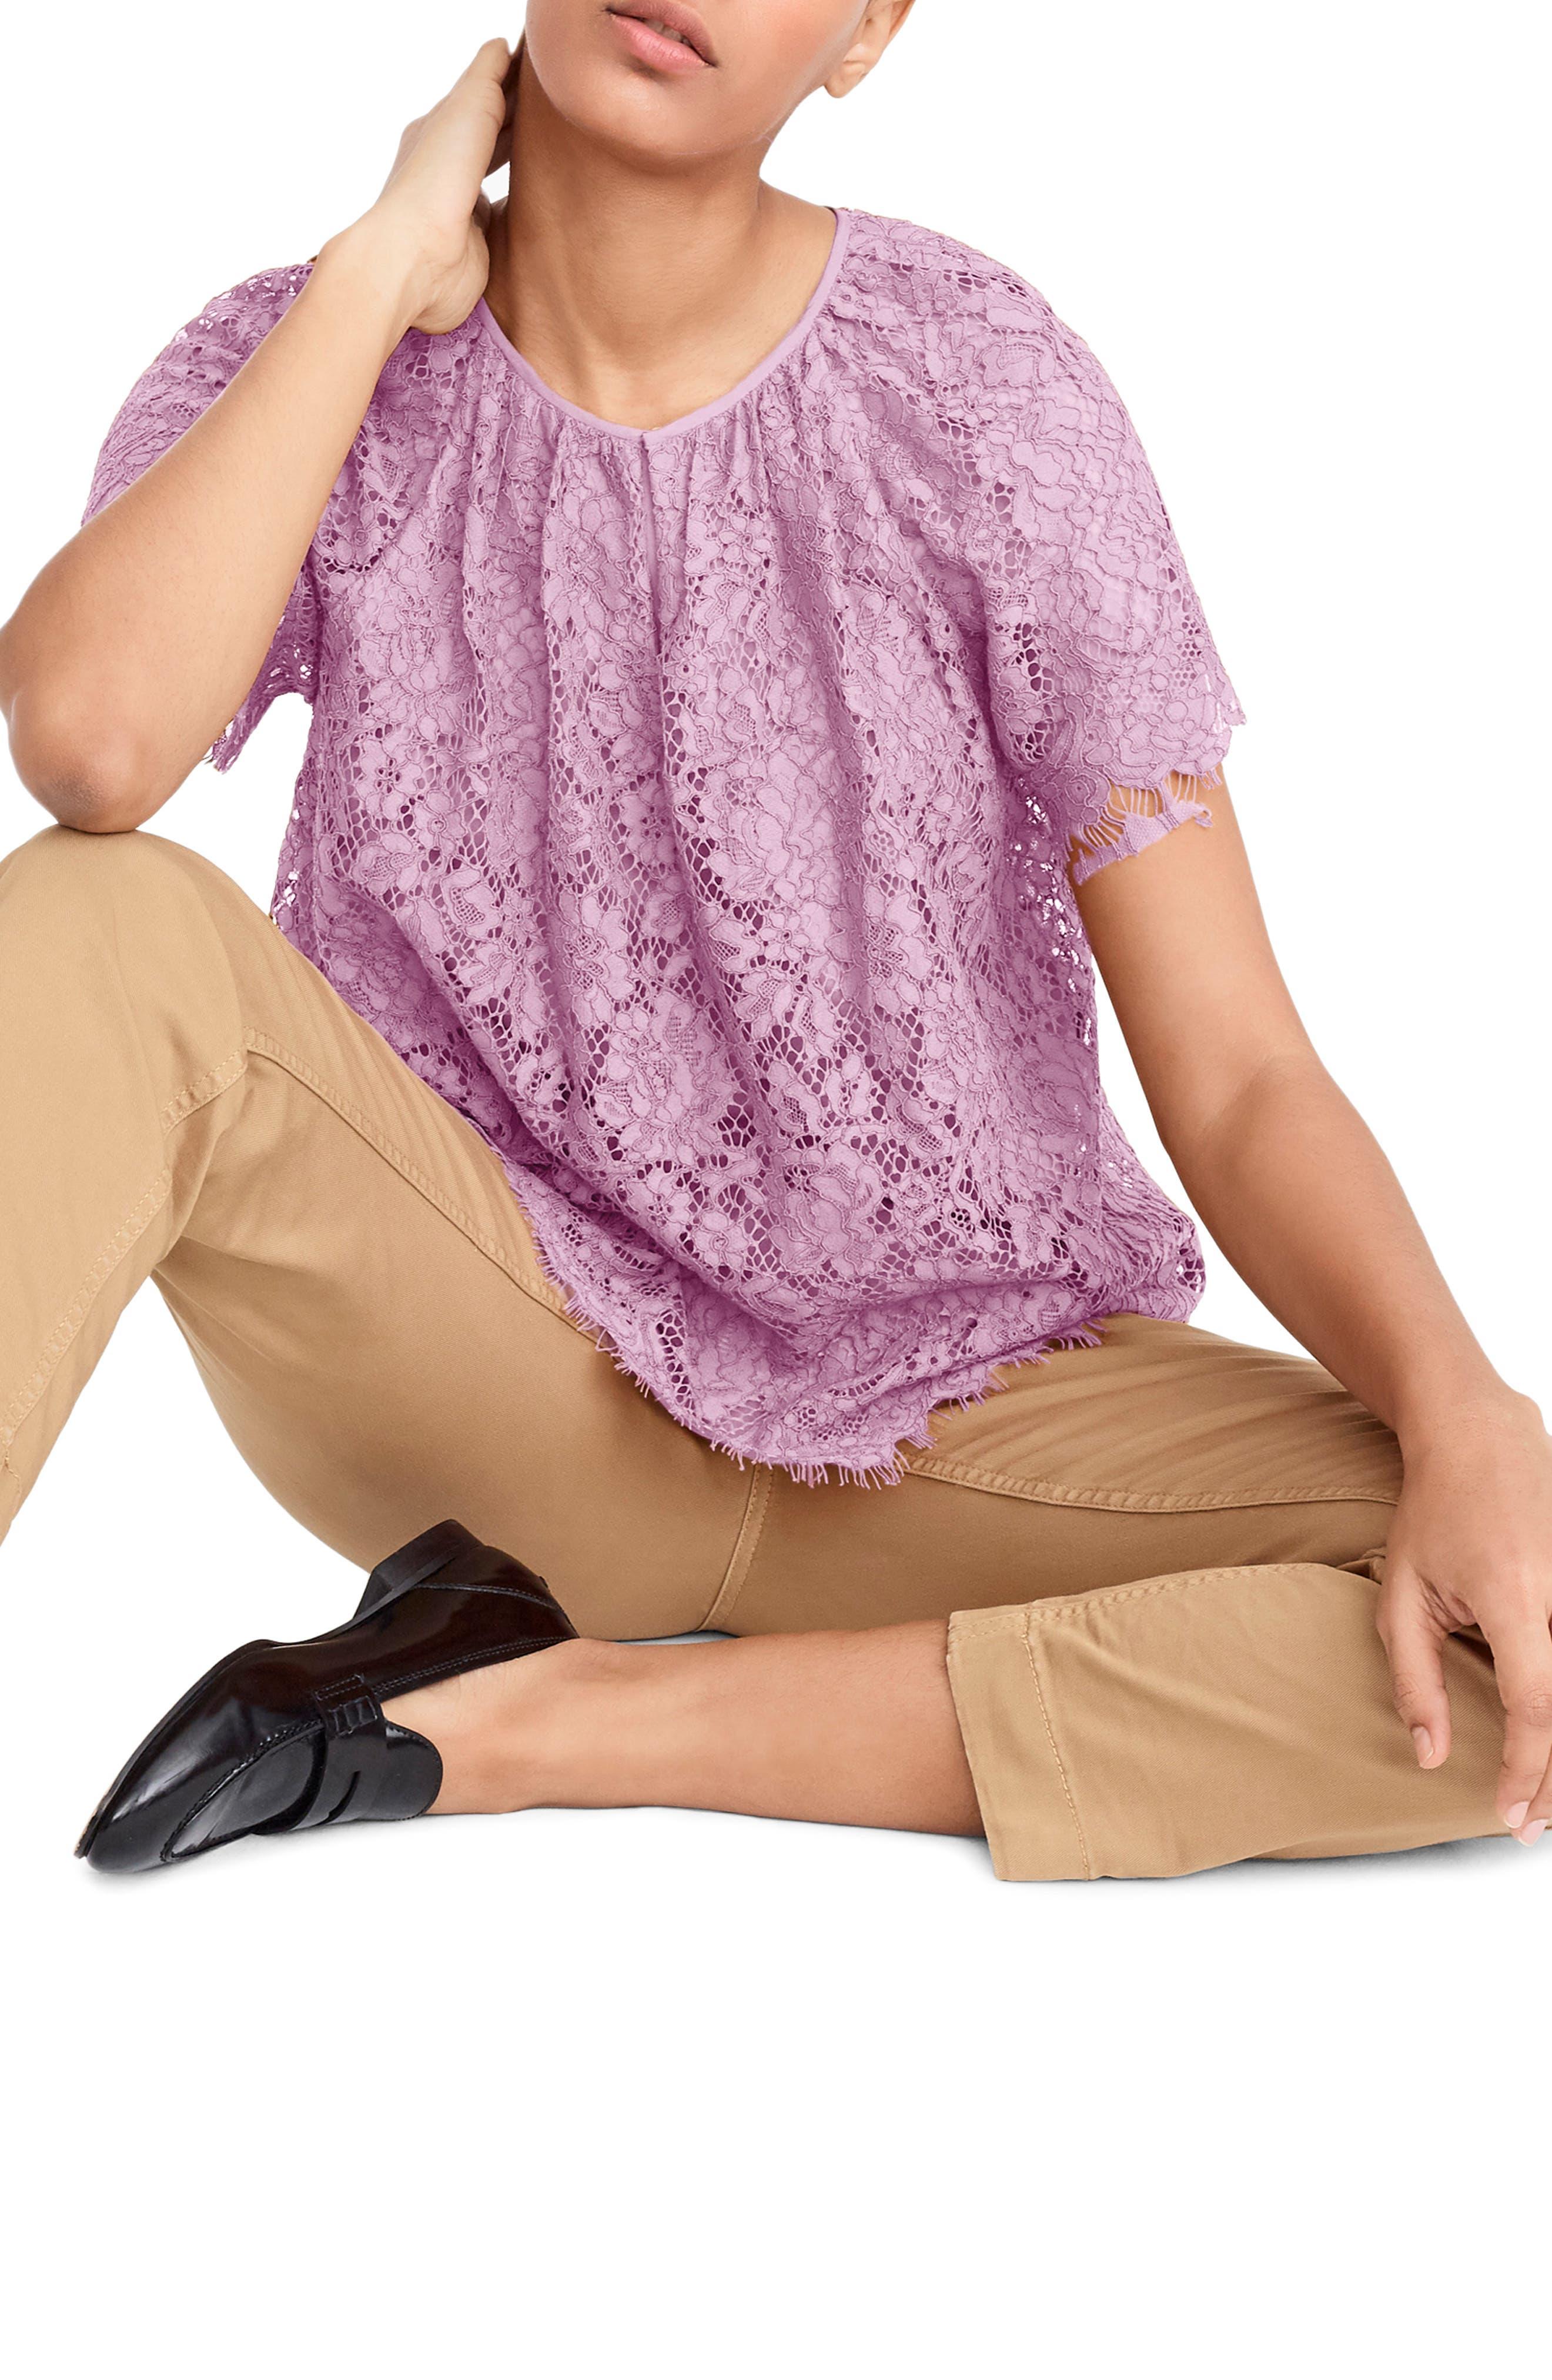 J.CREW,                             Short Sleeve Lace Top,                             Main thumbnail 1, color,                             VIVID LILAC